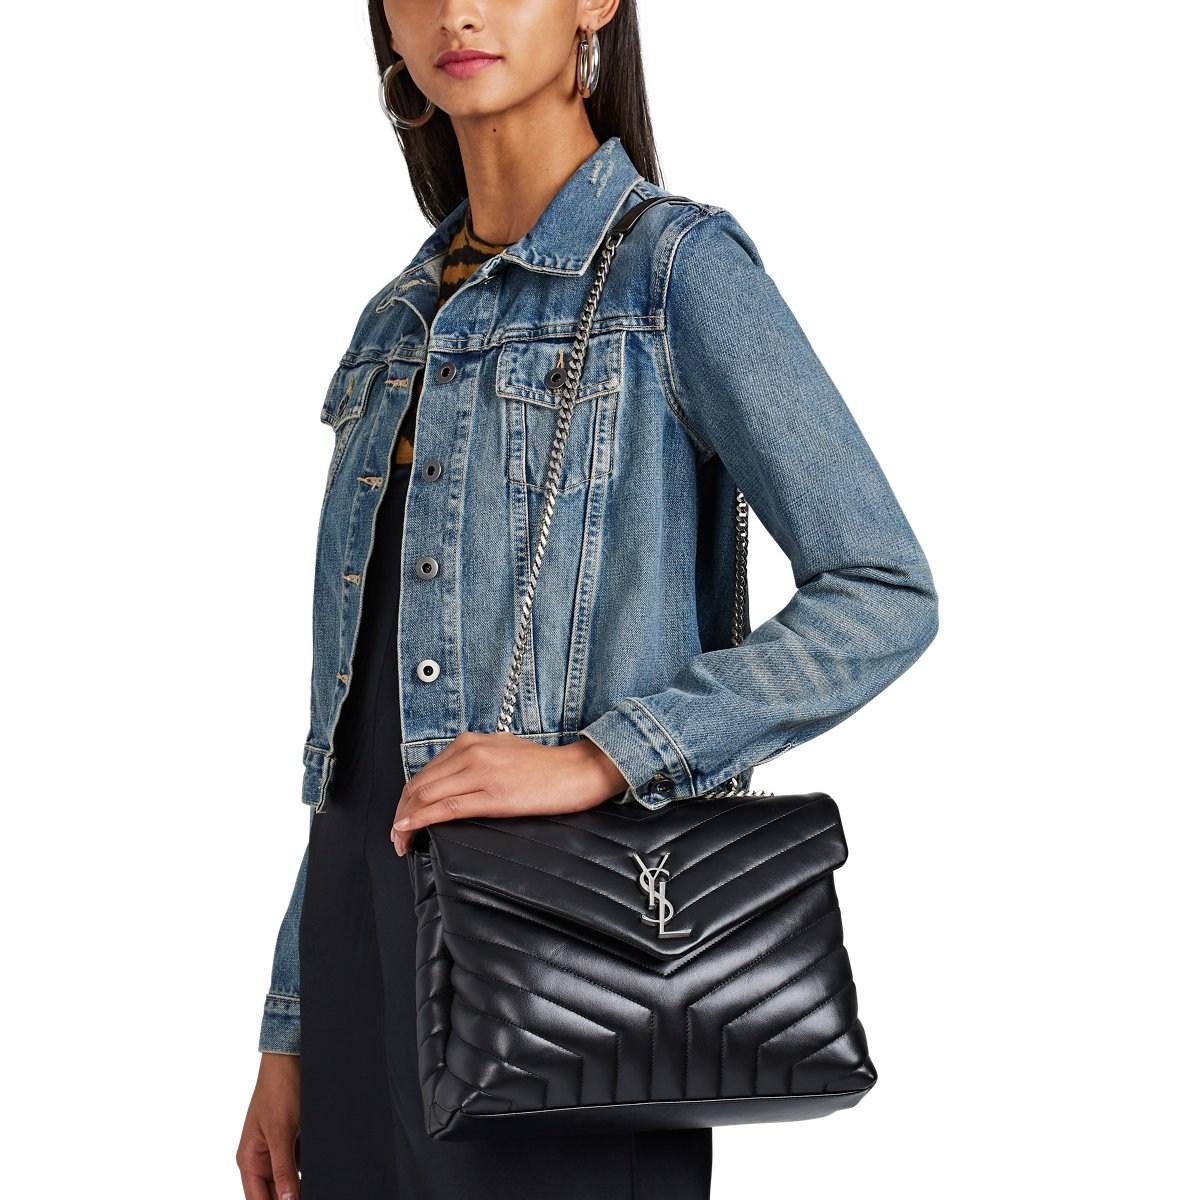 35ced8caf57 Saint Laurent - Black Monogram Loulou Medium Leather Shoulder Bag - Lyst.  View fullscreen